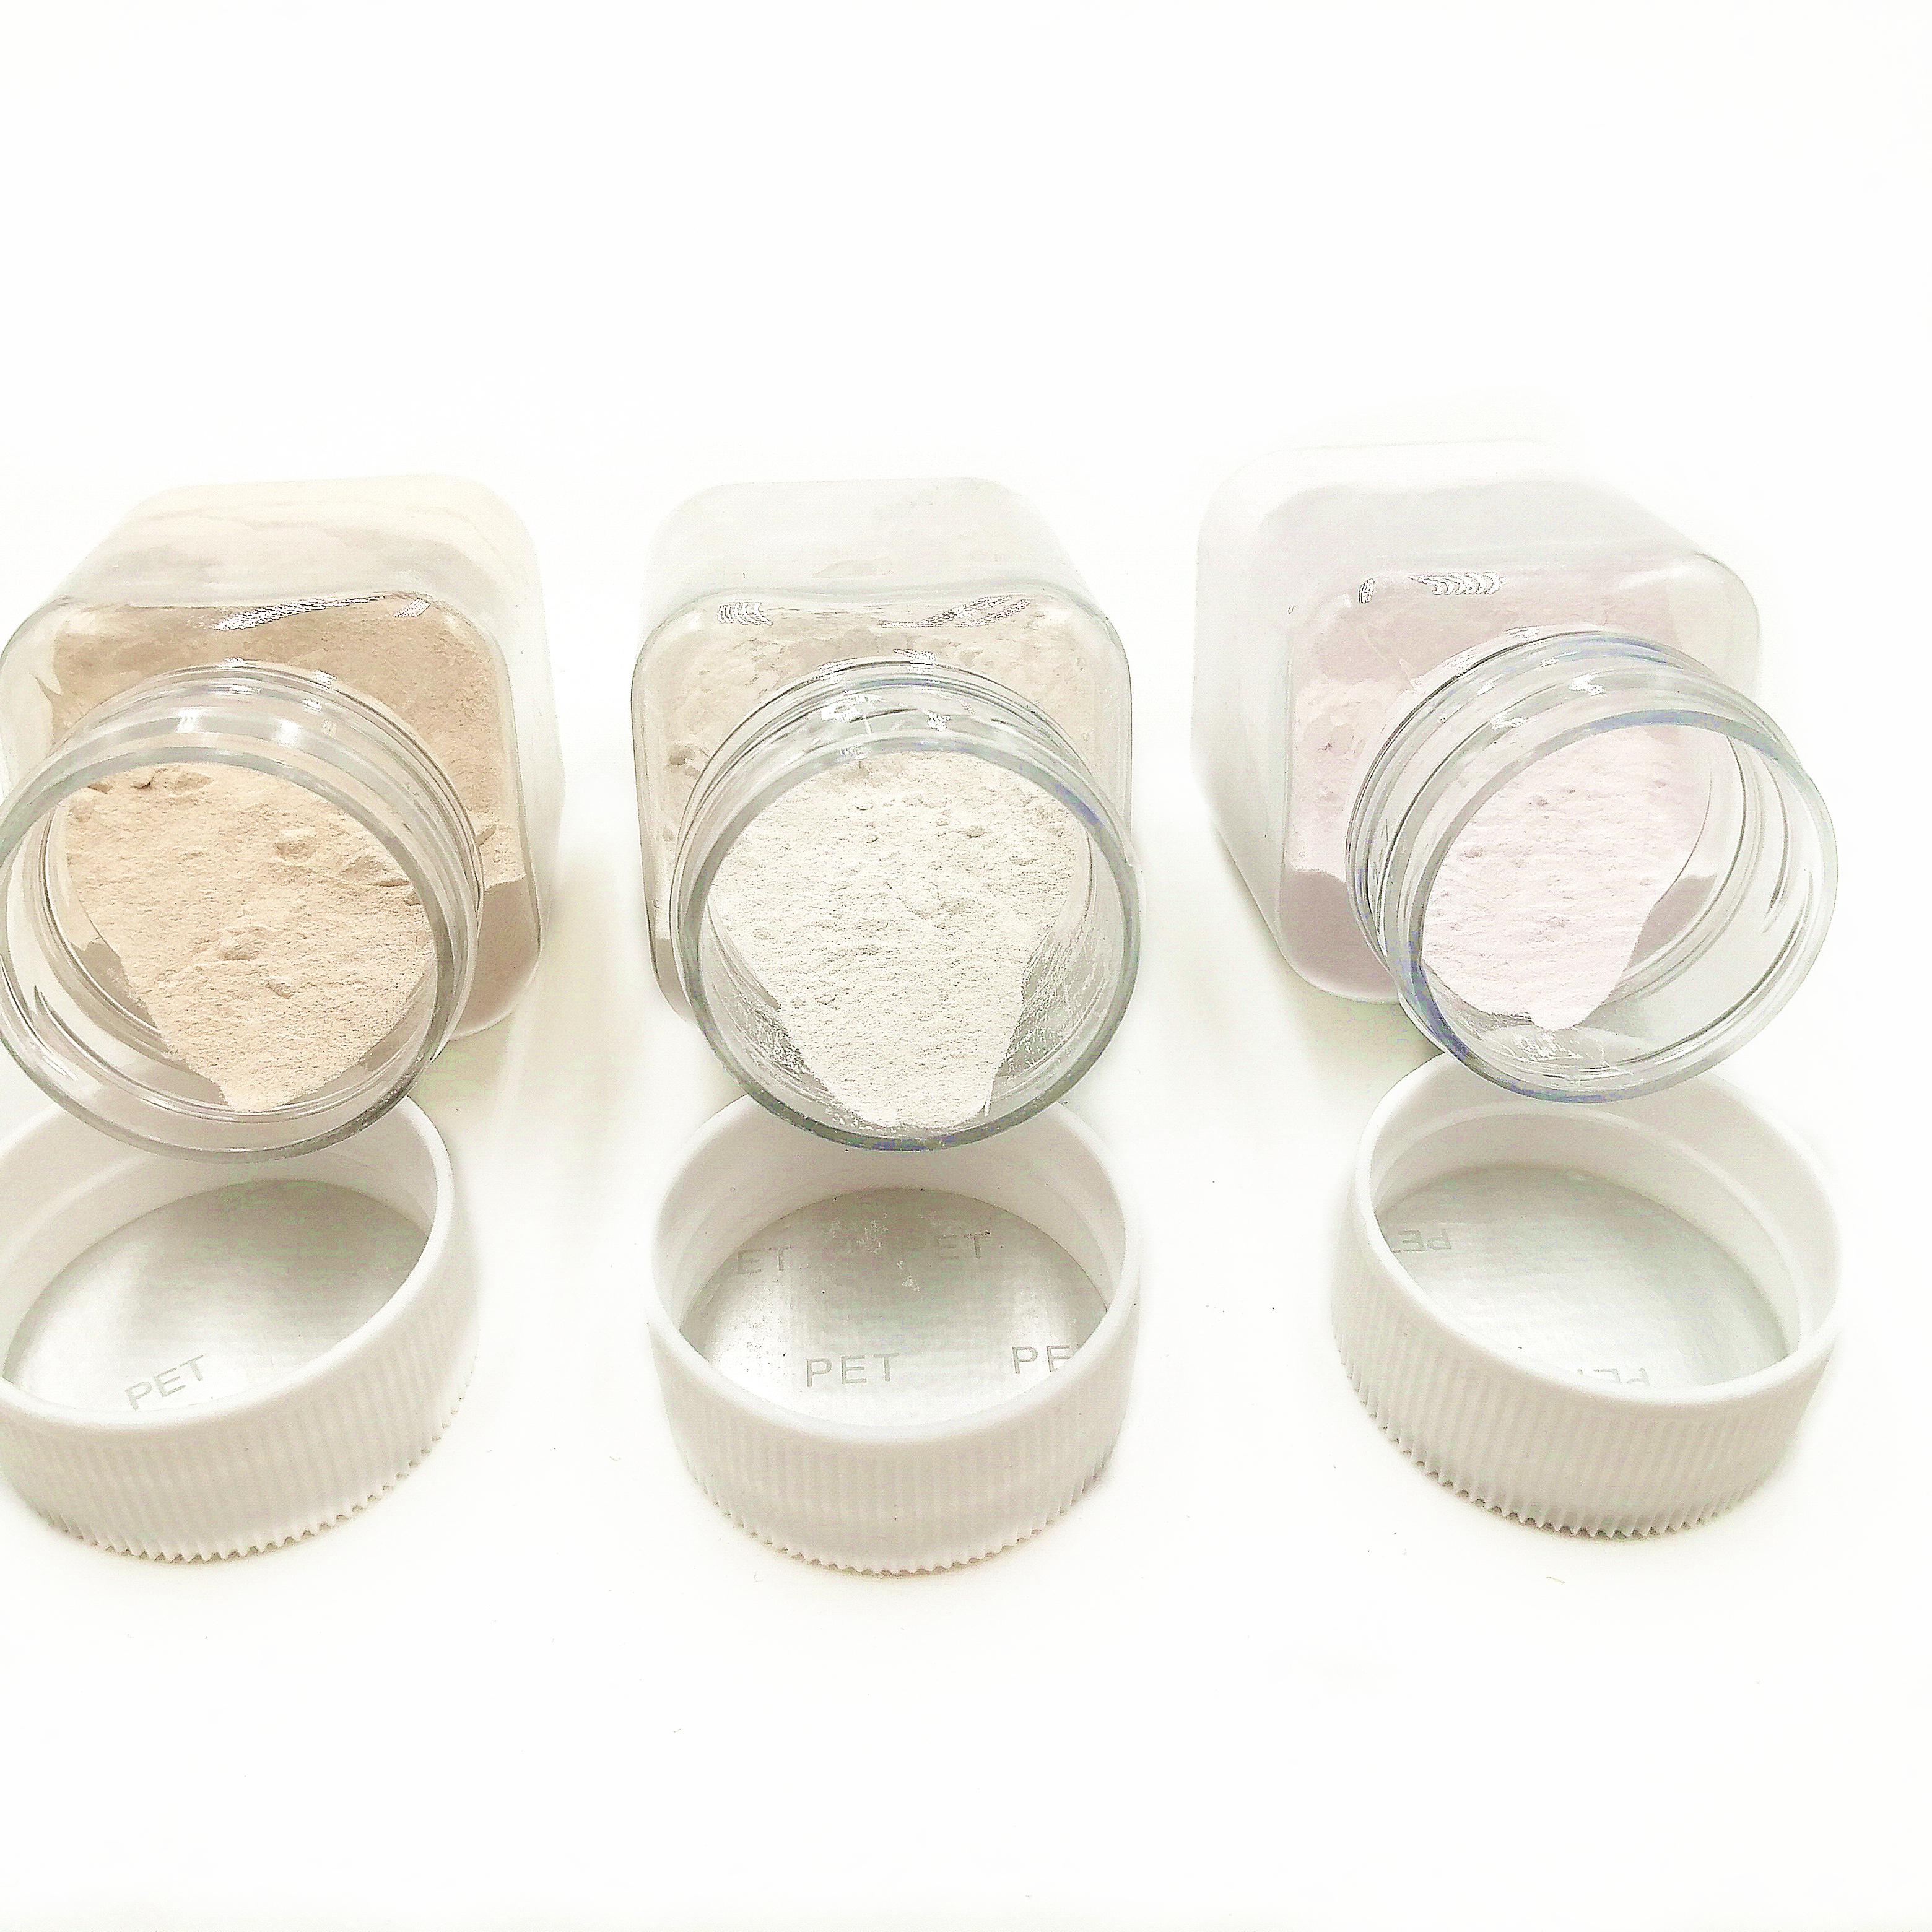 Good size Dental powder for 3D printing Yttrium stabilized zirconia ZrO2 Ceramic Featured Image